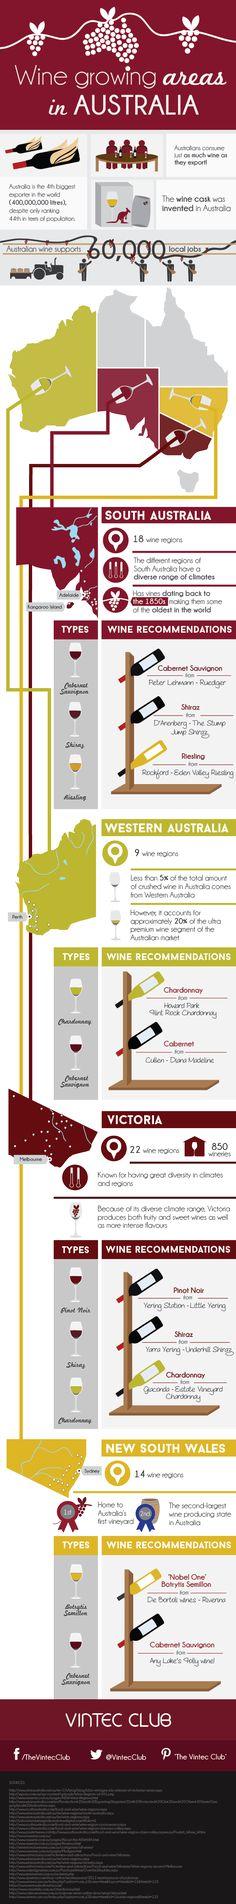 INFOGRAPHIC – Wine Growing Regions of Australia